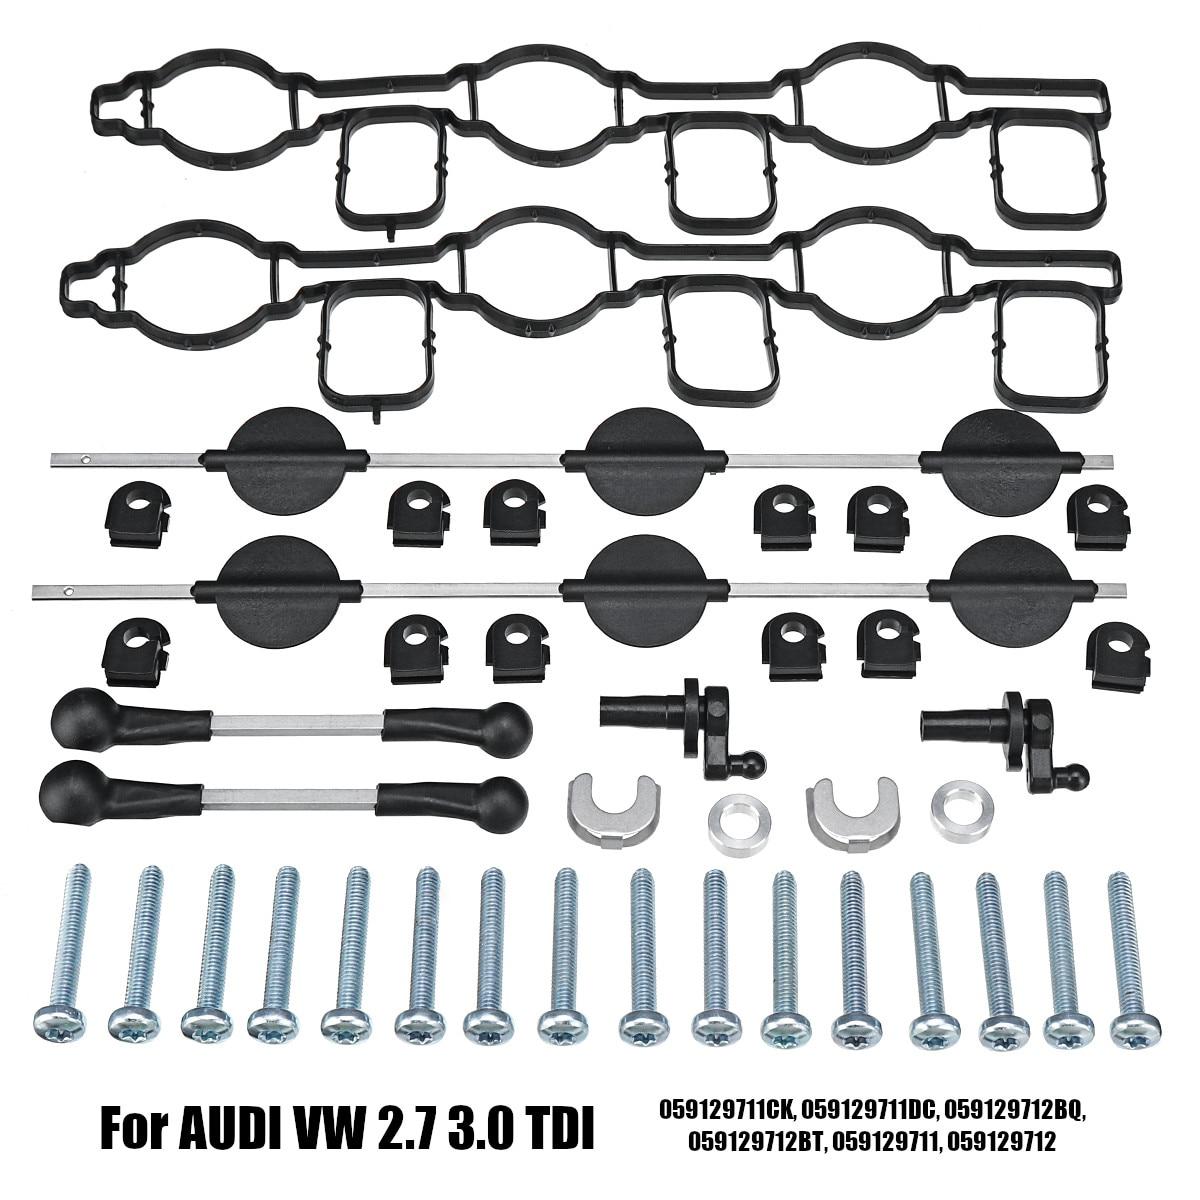 Inlet Intake Manifold Swirl Flaps Set for AUDI for VW 2.7 TDI A4 A5 A6 A8 Touareg 059129711CK 059129711DC 059129712BQ 059129712B inlet manifold intake manifold for vw audi seat 1 8 tsi tfi cdaa